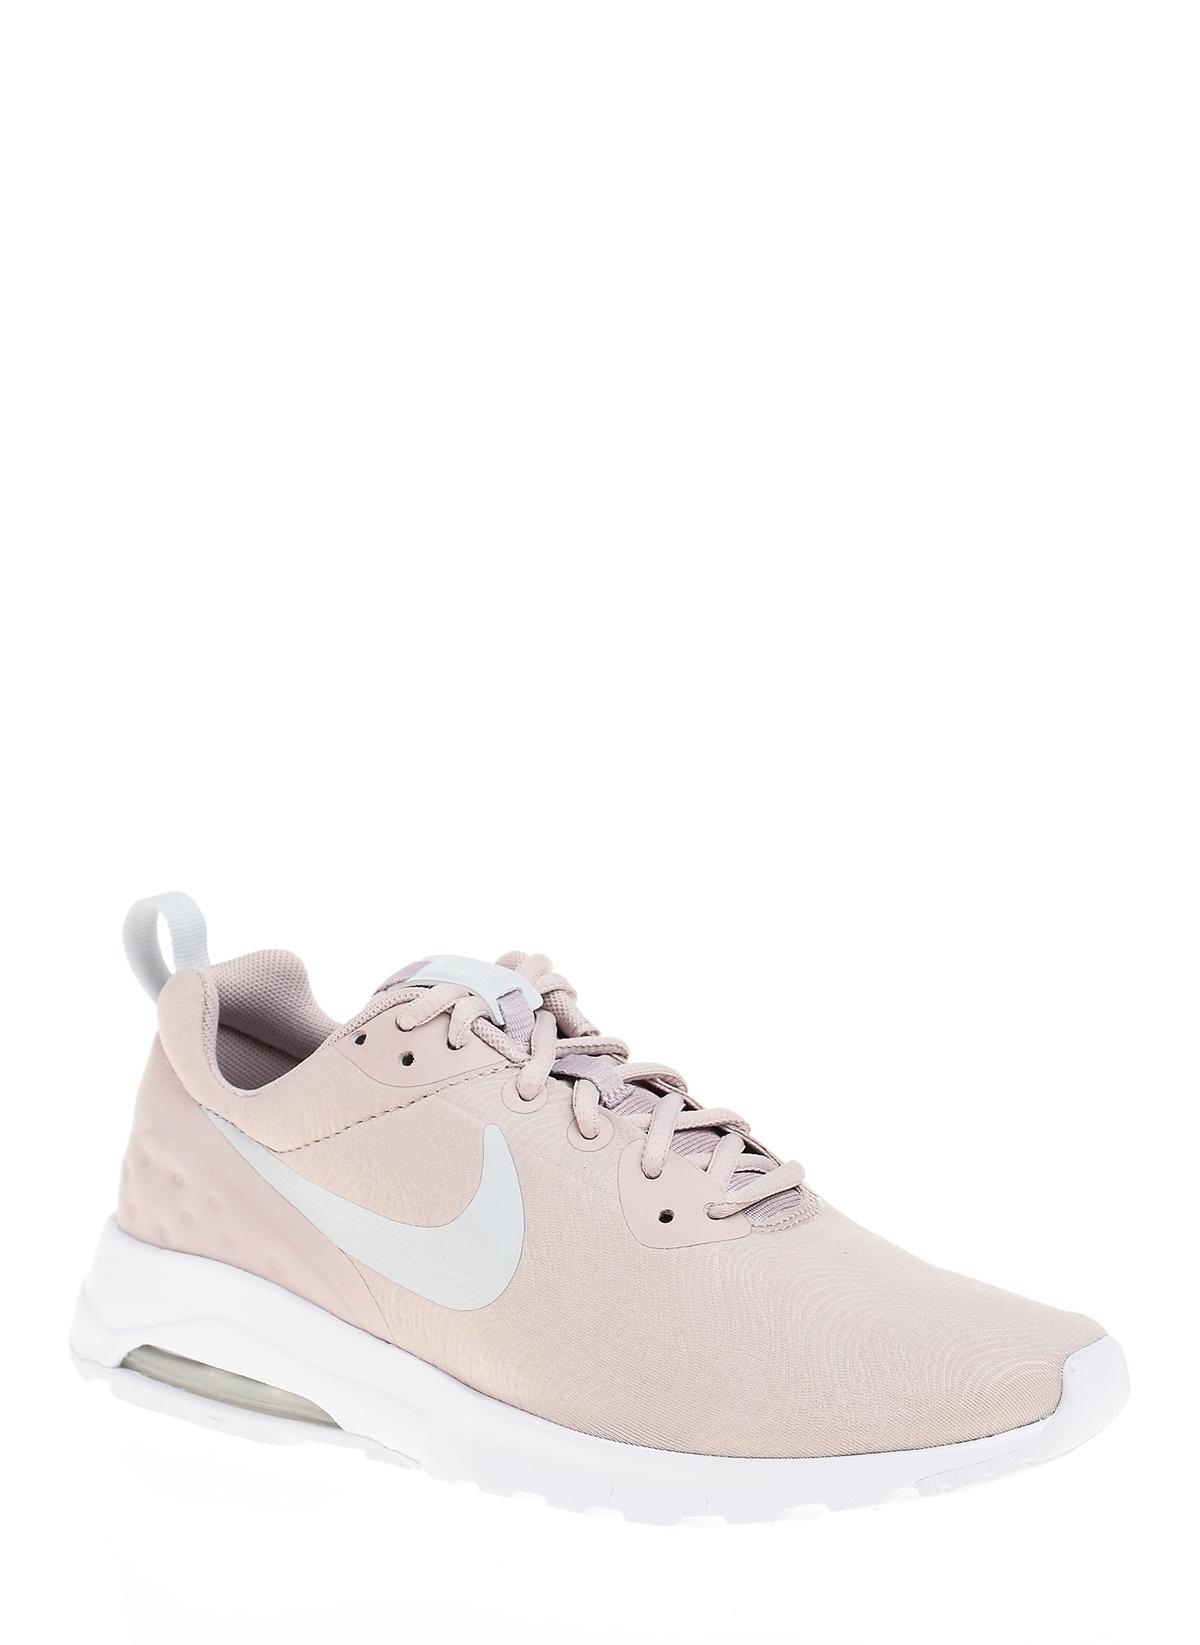 92f0c53b97 Nike Kadın Air Max Motion Lw Se Particle Rose/Pure Platinum-Su ...